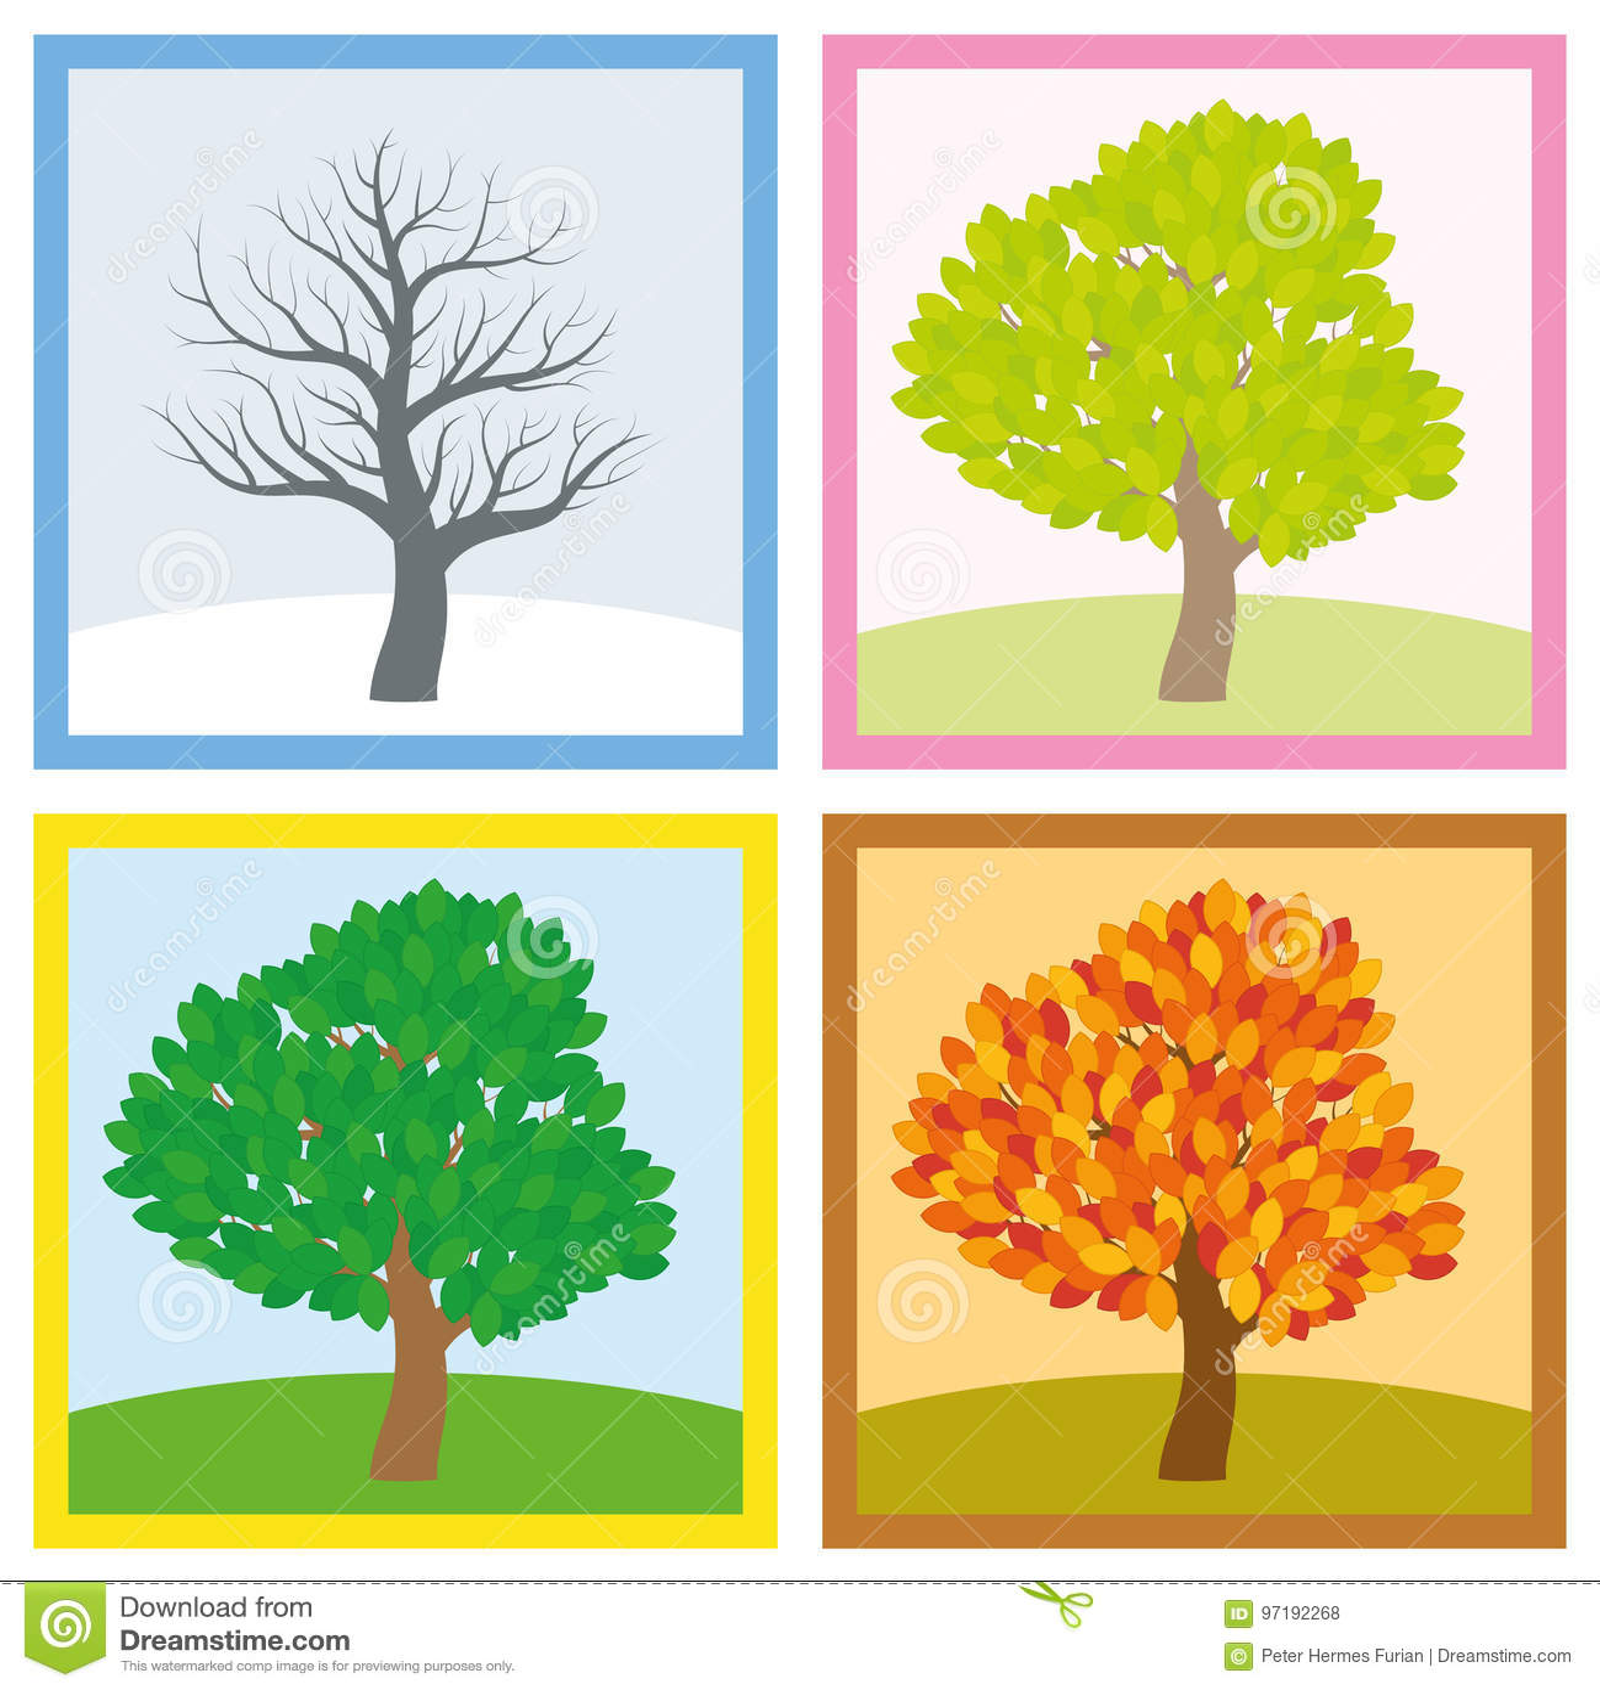 Tree Four Seasons Year Change Stock Vector